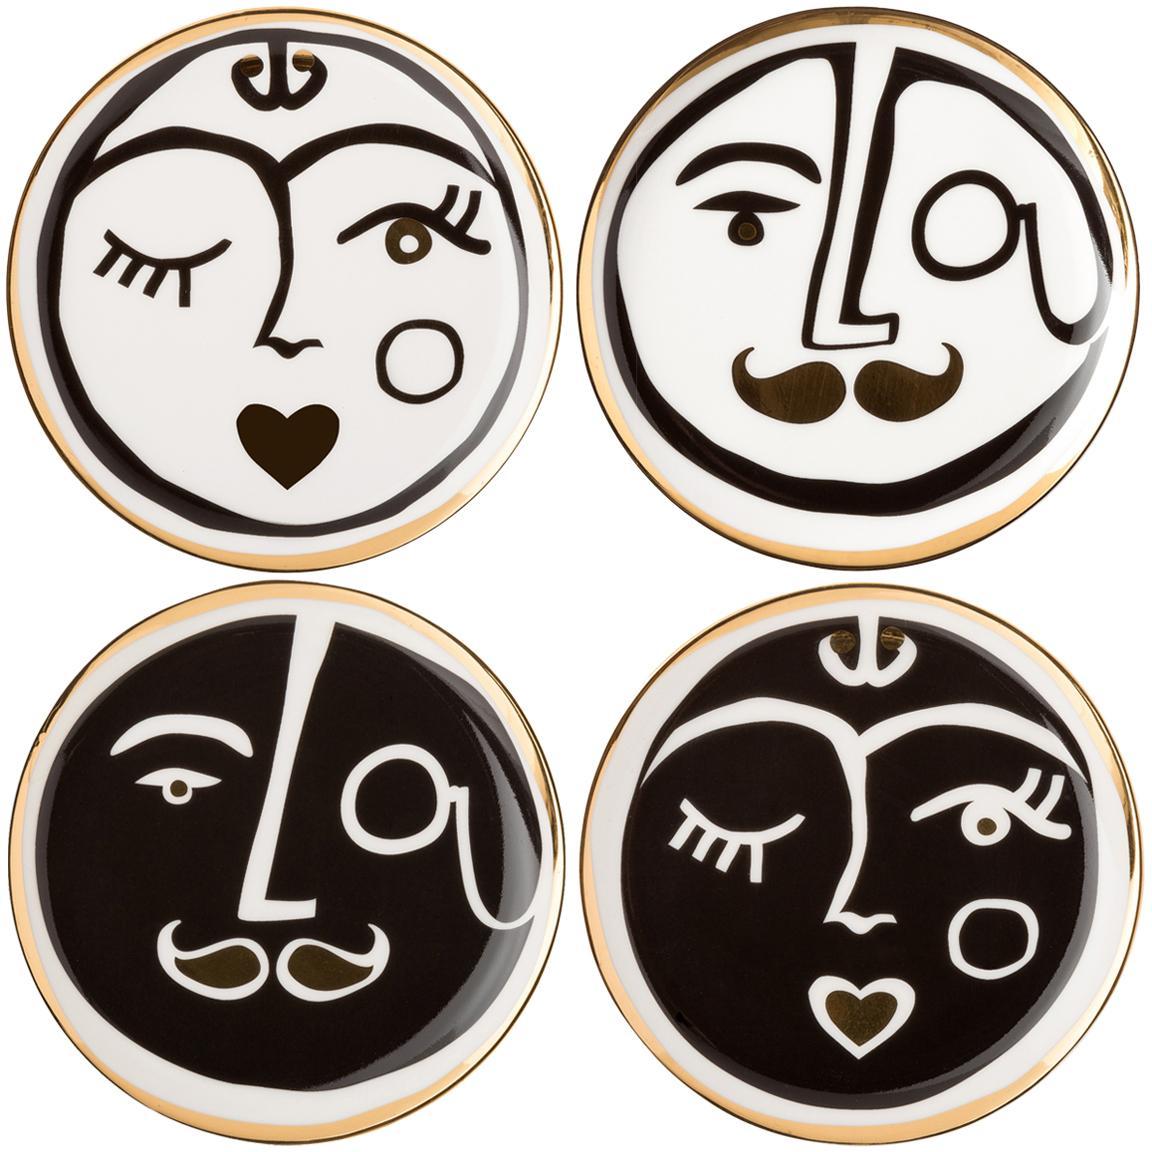 Set de posavasos Gentlemen, 4pzas., Porcelana, Dorado, negro, blanco, Ø 10 cm